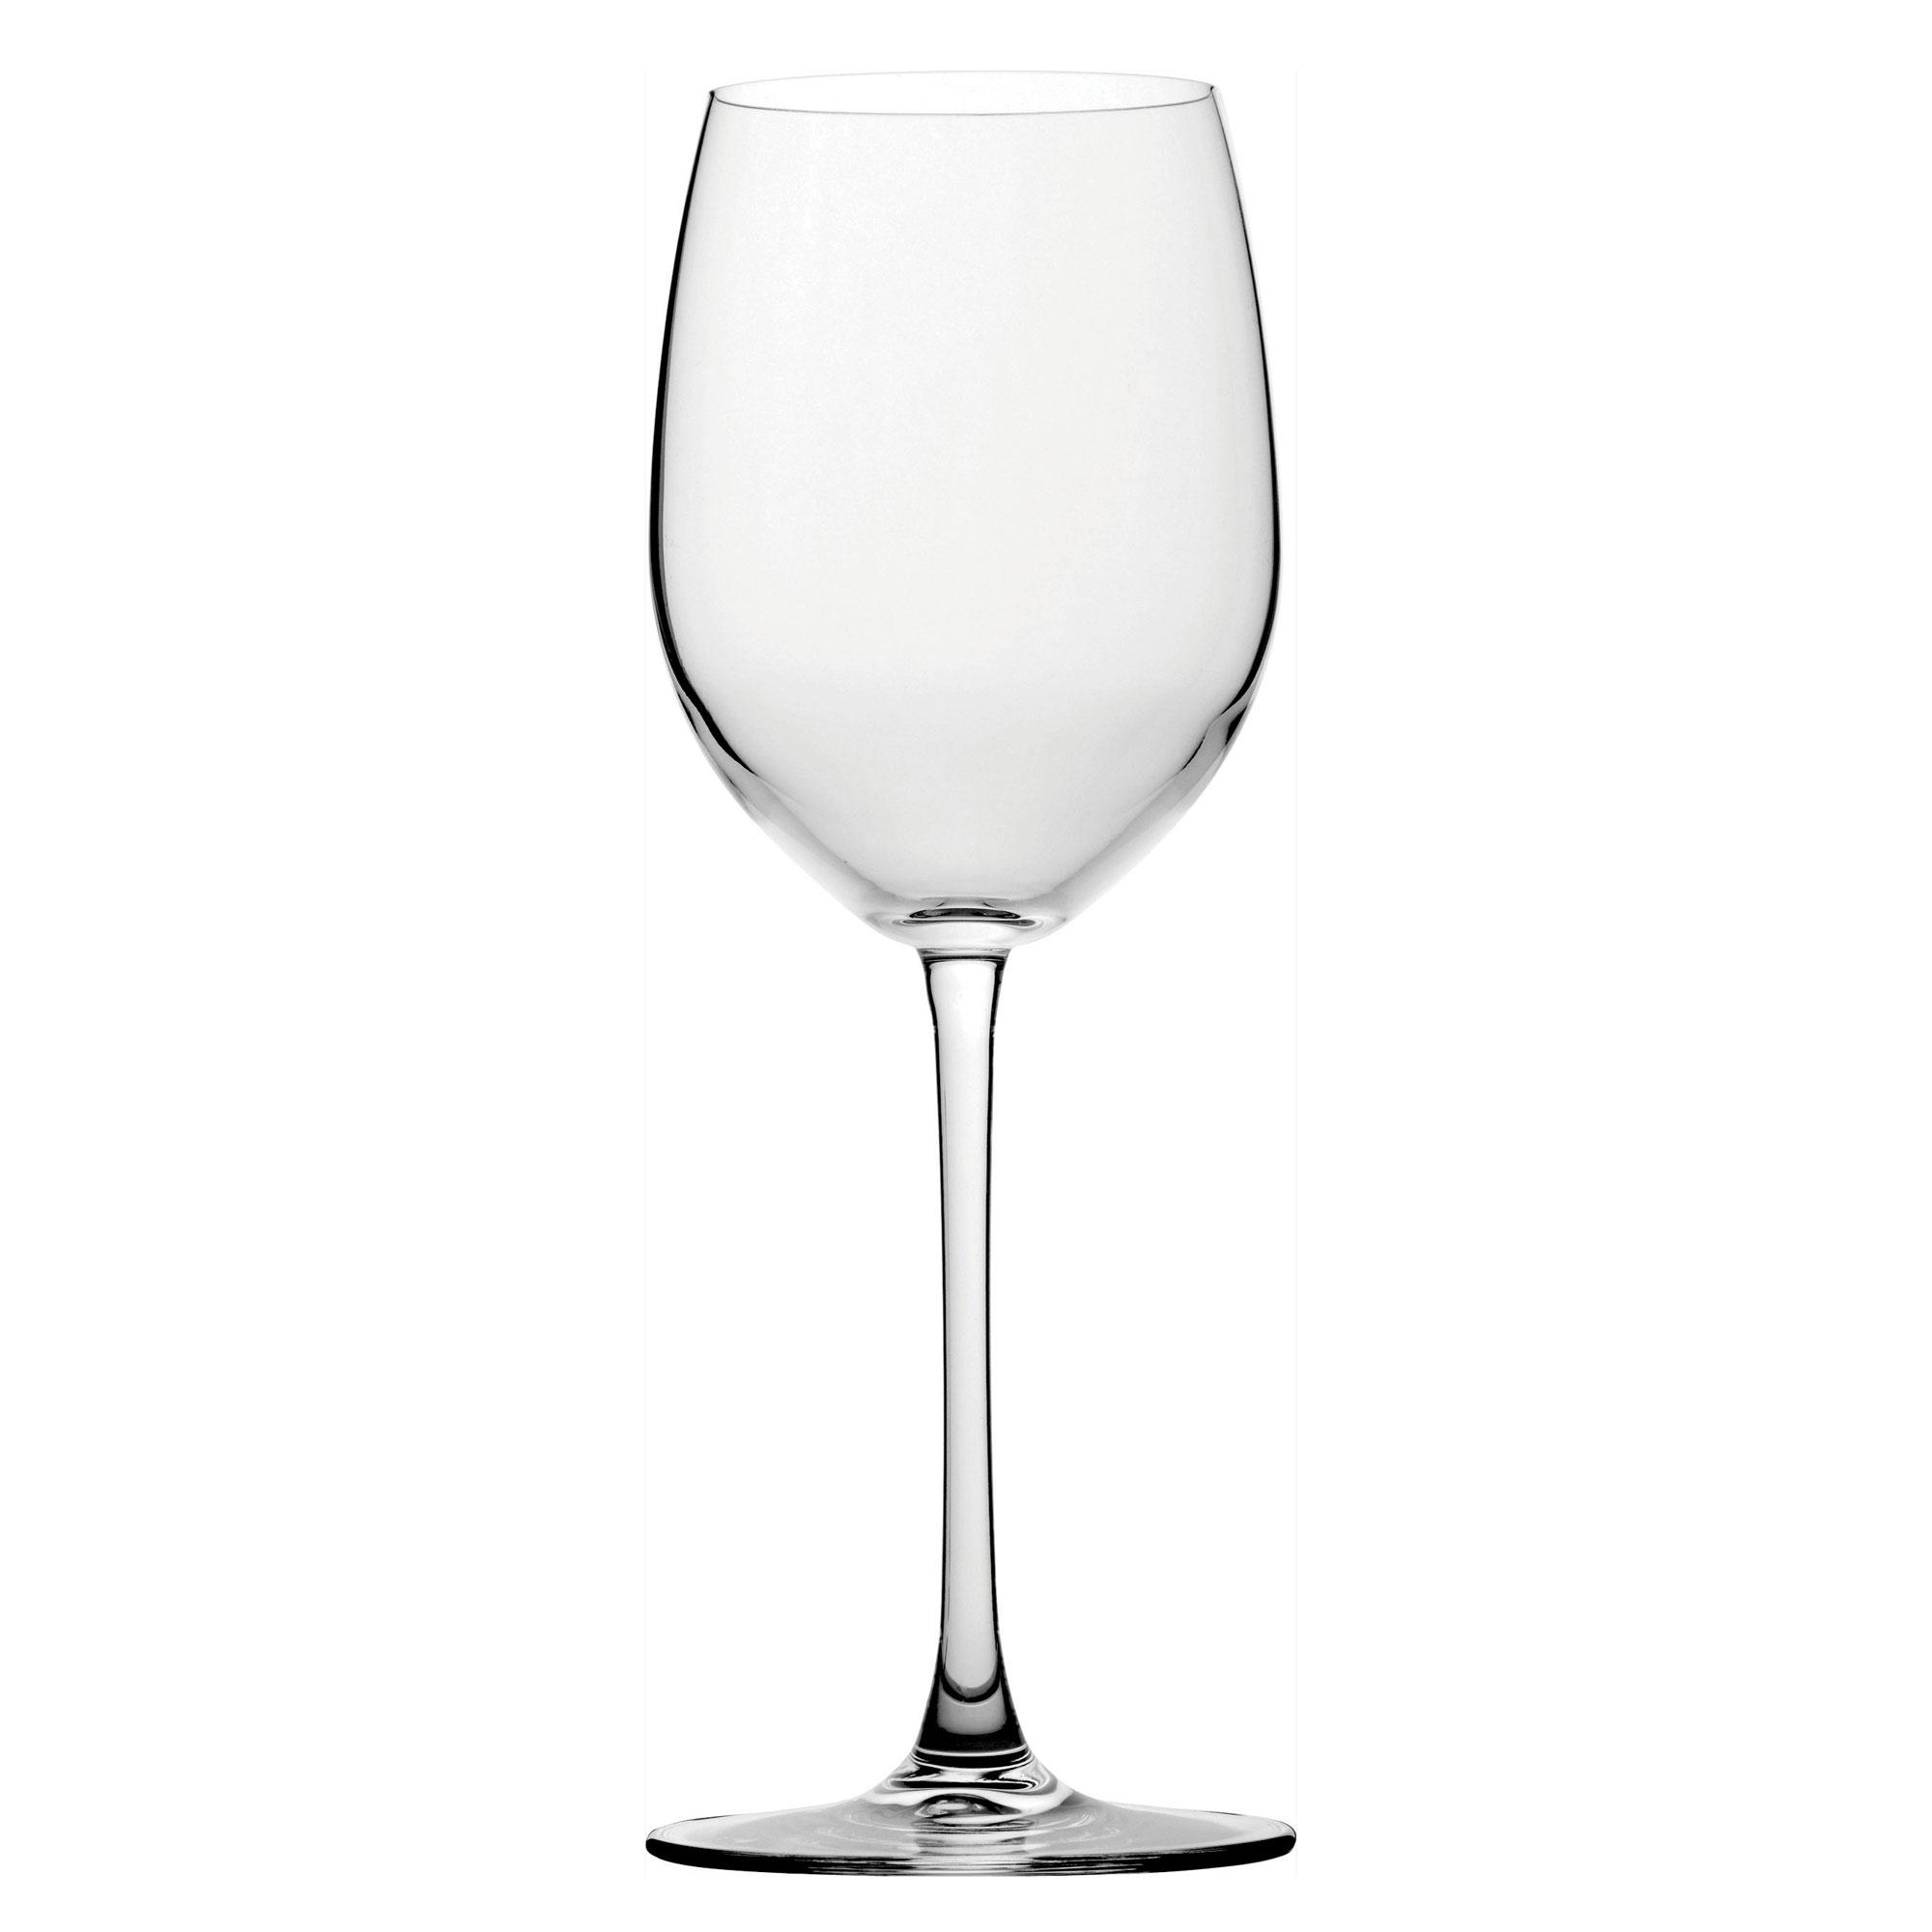 Nude Bar U0026 Table Sauvignon Glasses 11.5oz / 330ml